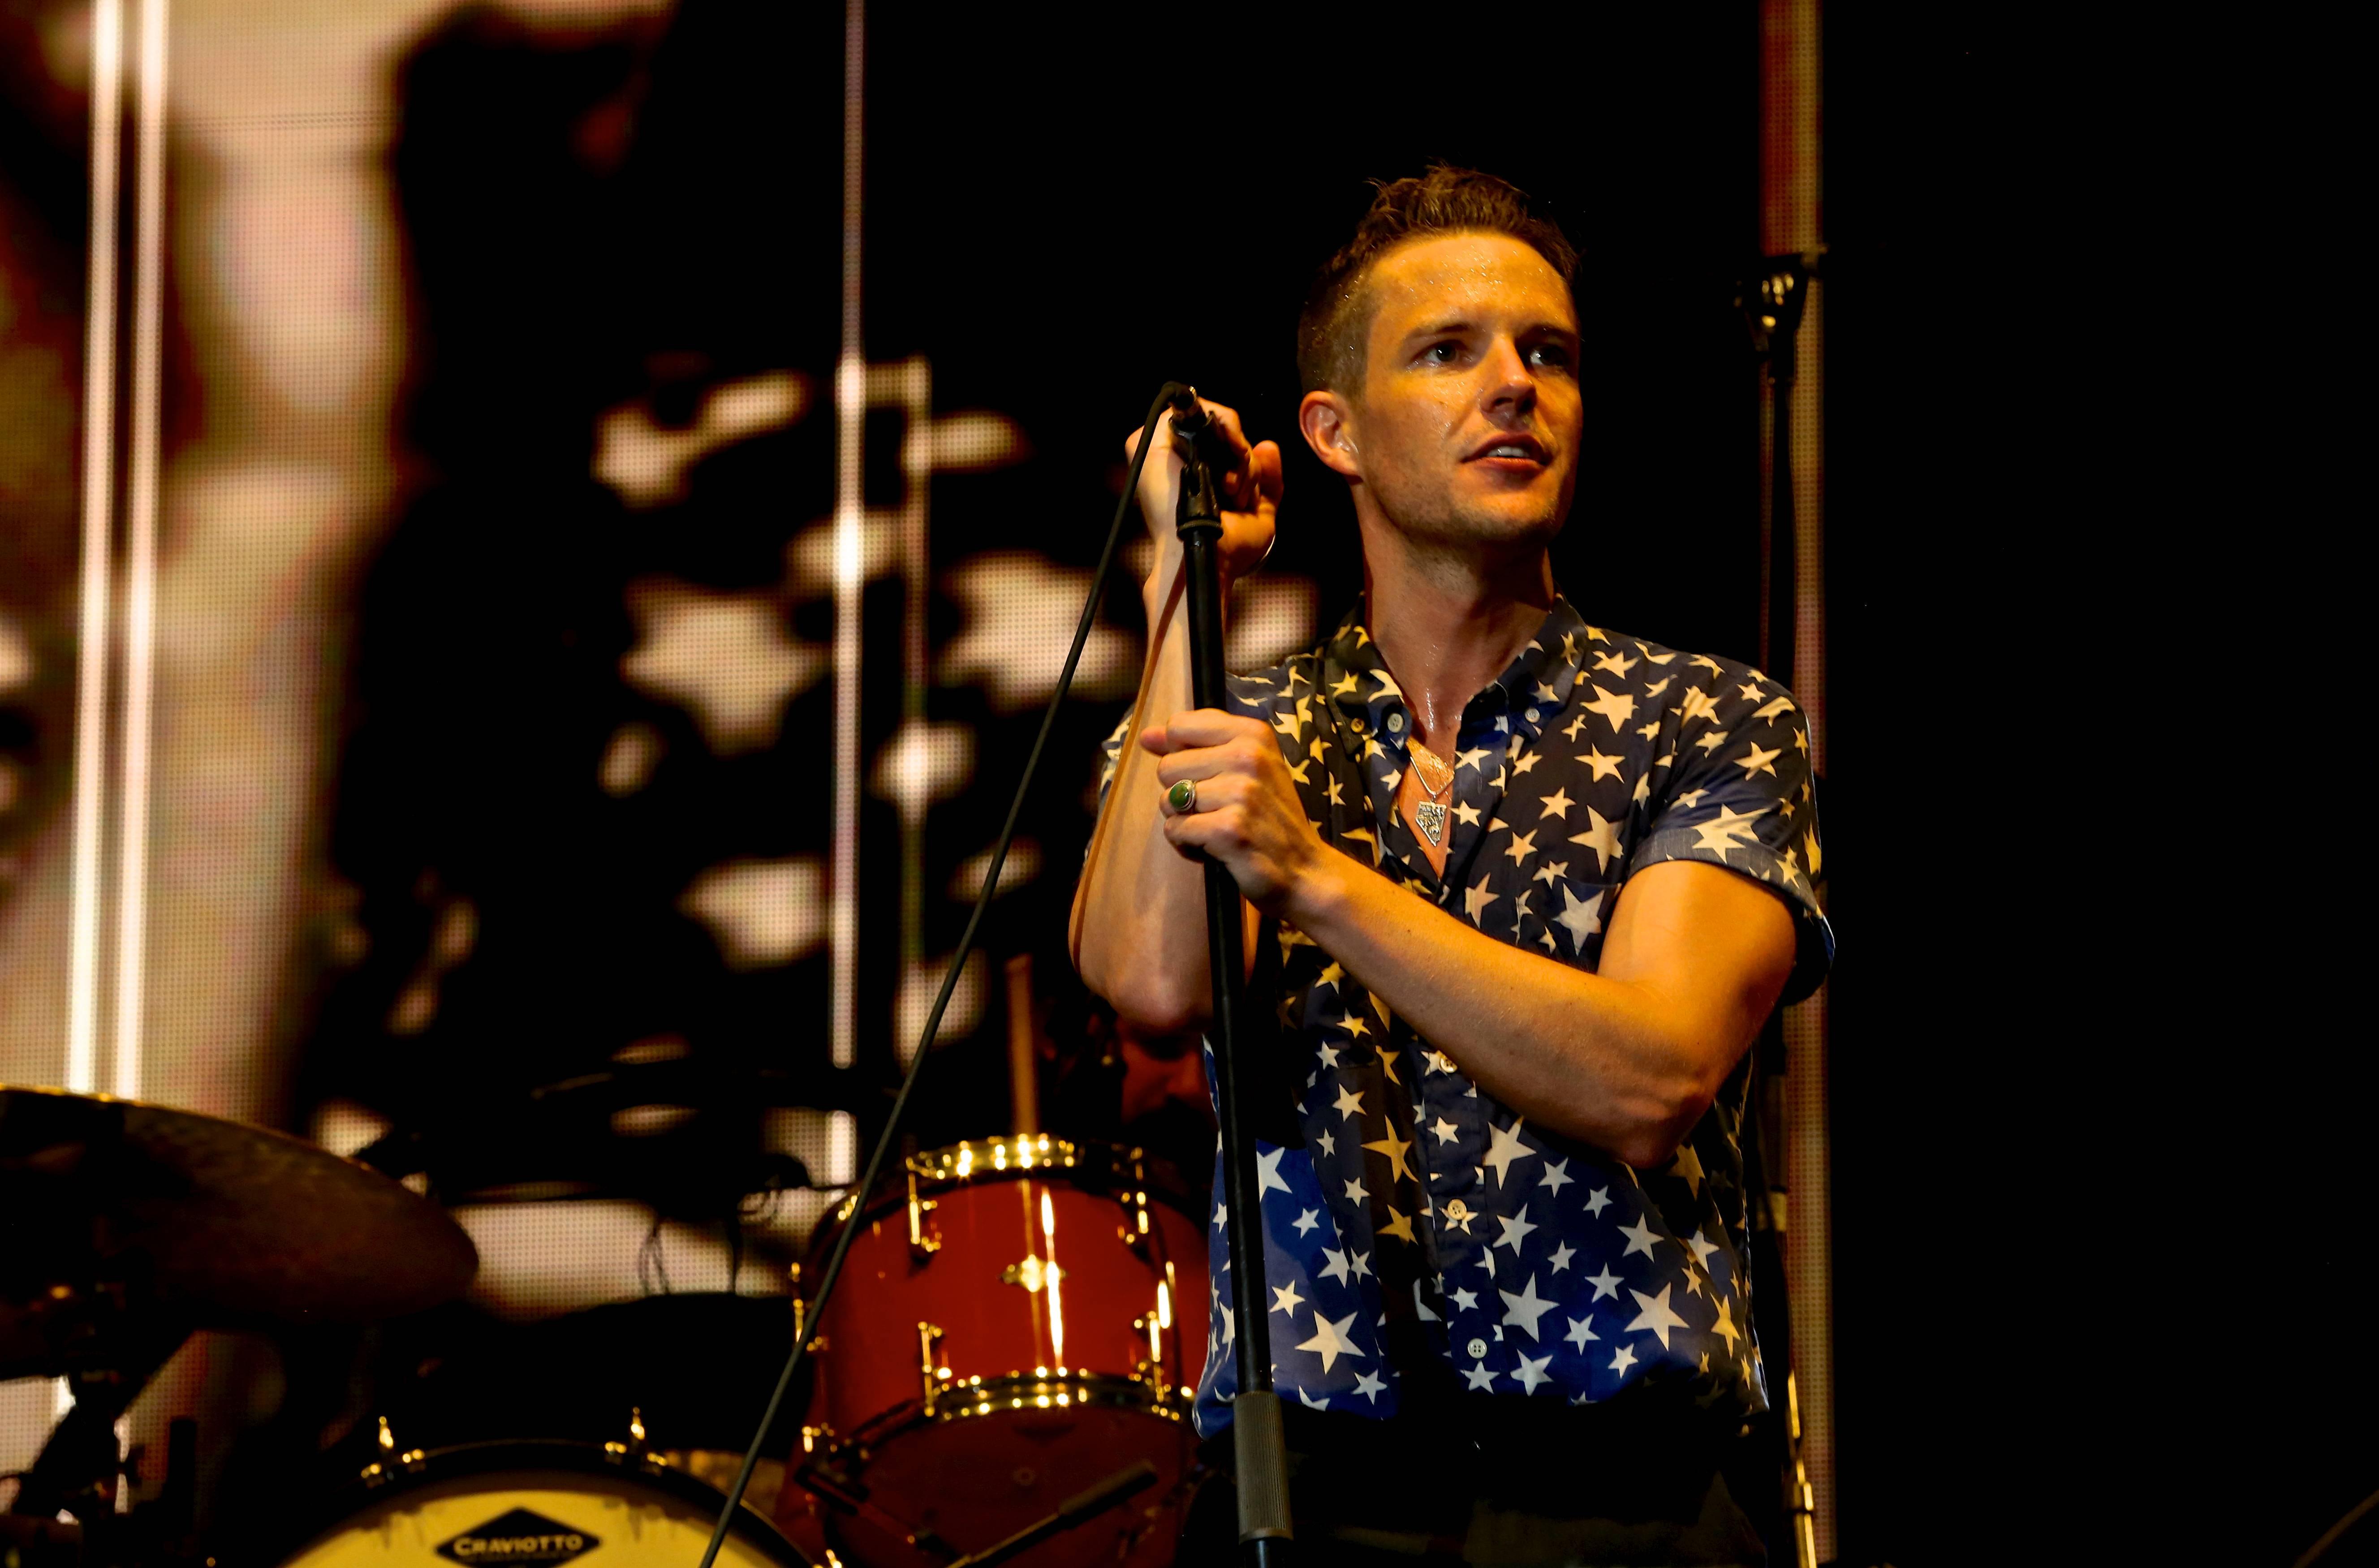 Lollapalooza 2013 Day One: The Killers, Atlas Genius, Rock